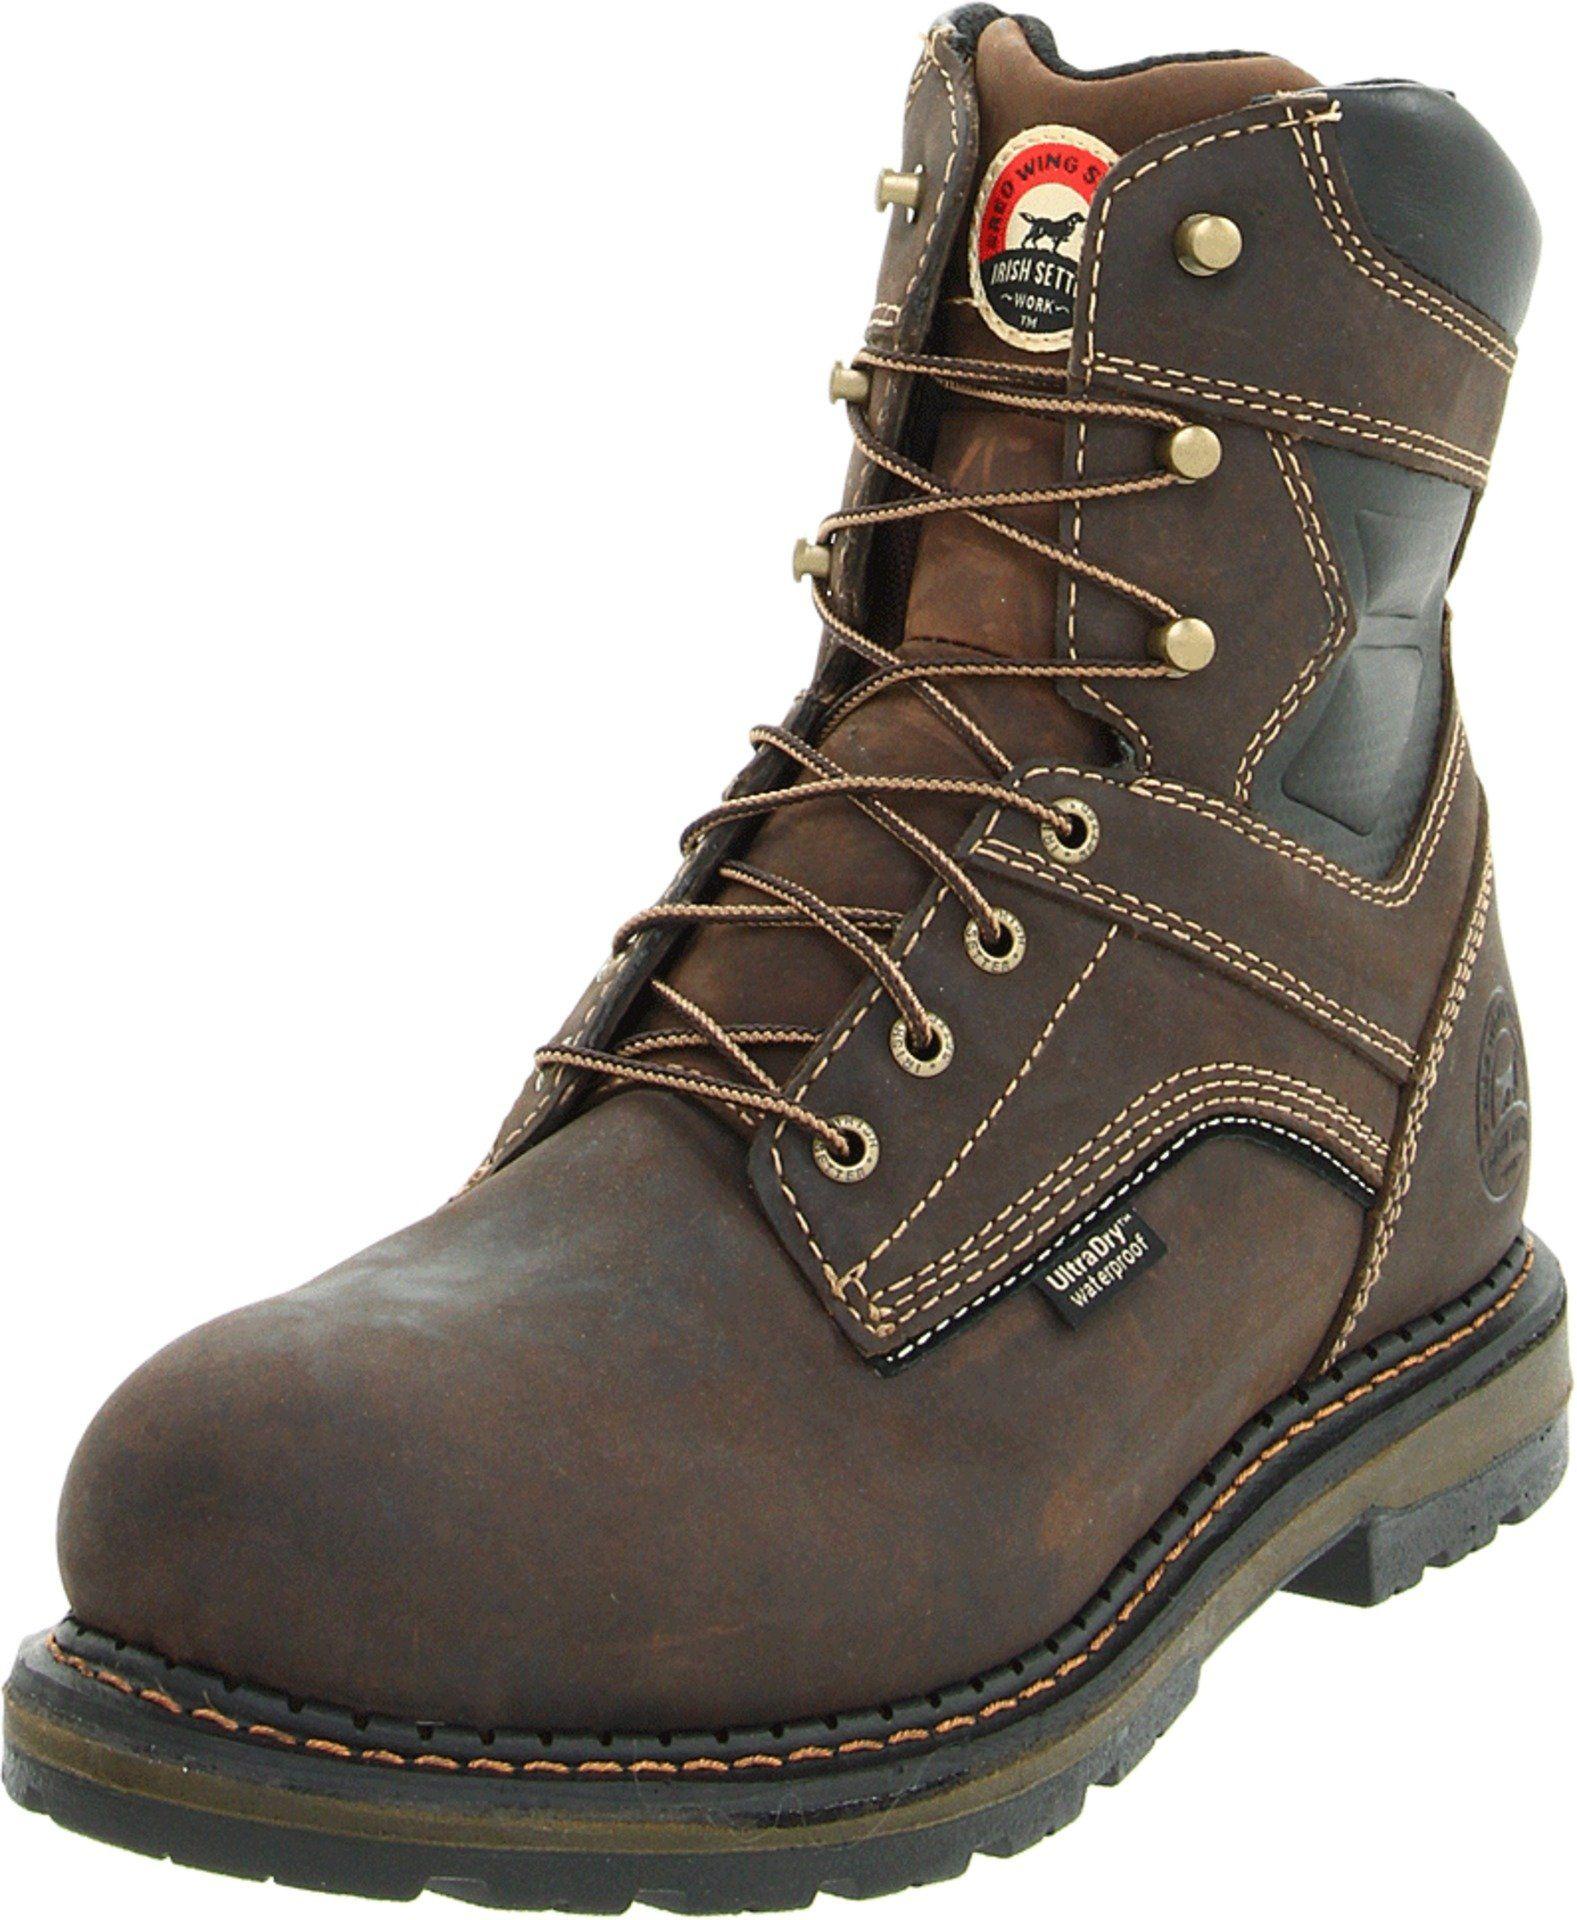 "Irish Setter Men's 83801 8"" Work Boot,Brown,8 D US (With"